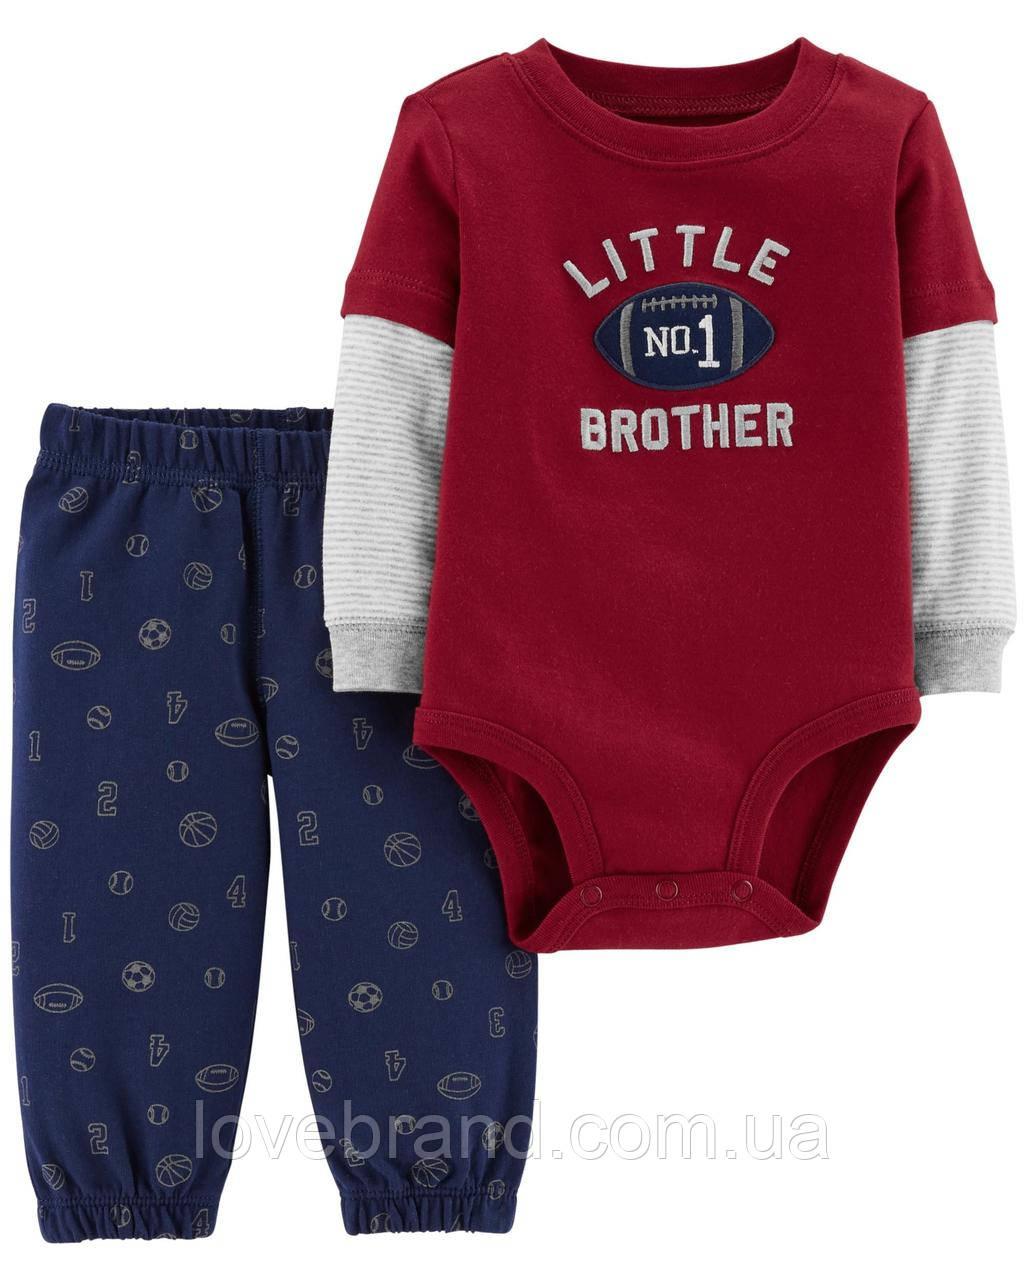 "Набор для мальчика Carter's боди + штанишки ""Little Brother №1"" 9 мес/67-72 см"